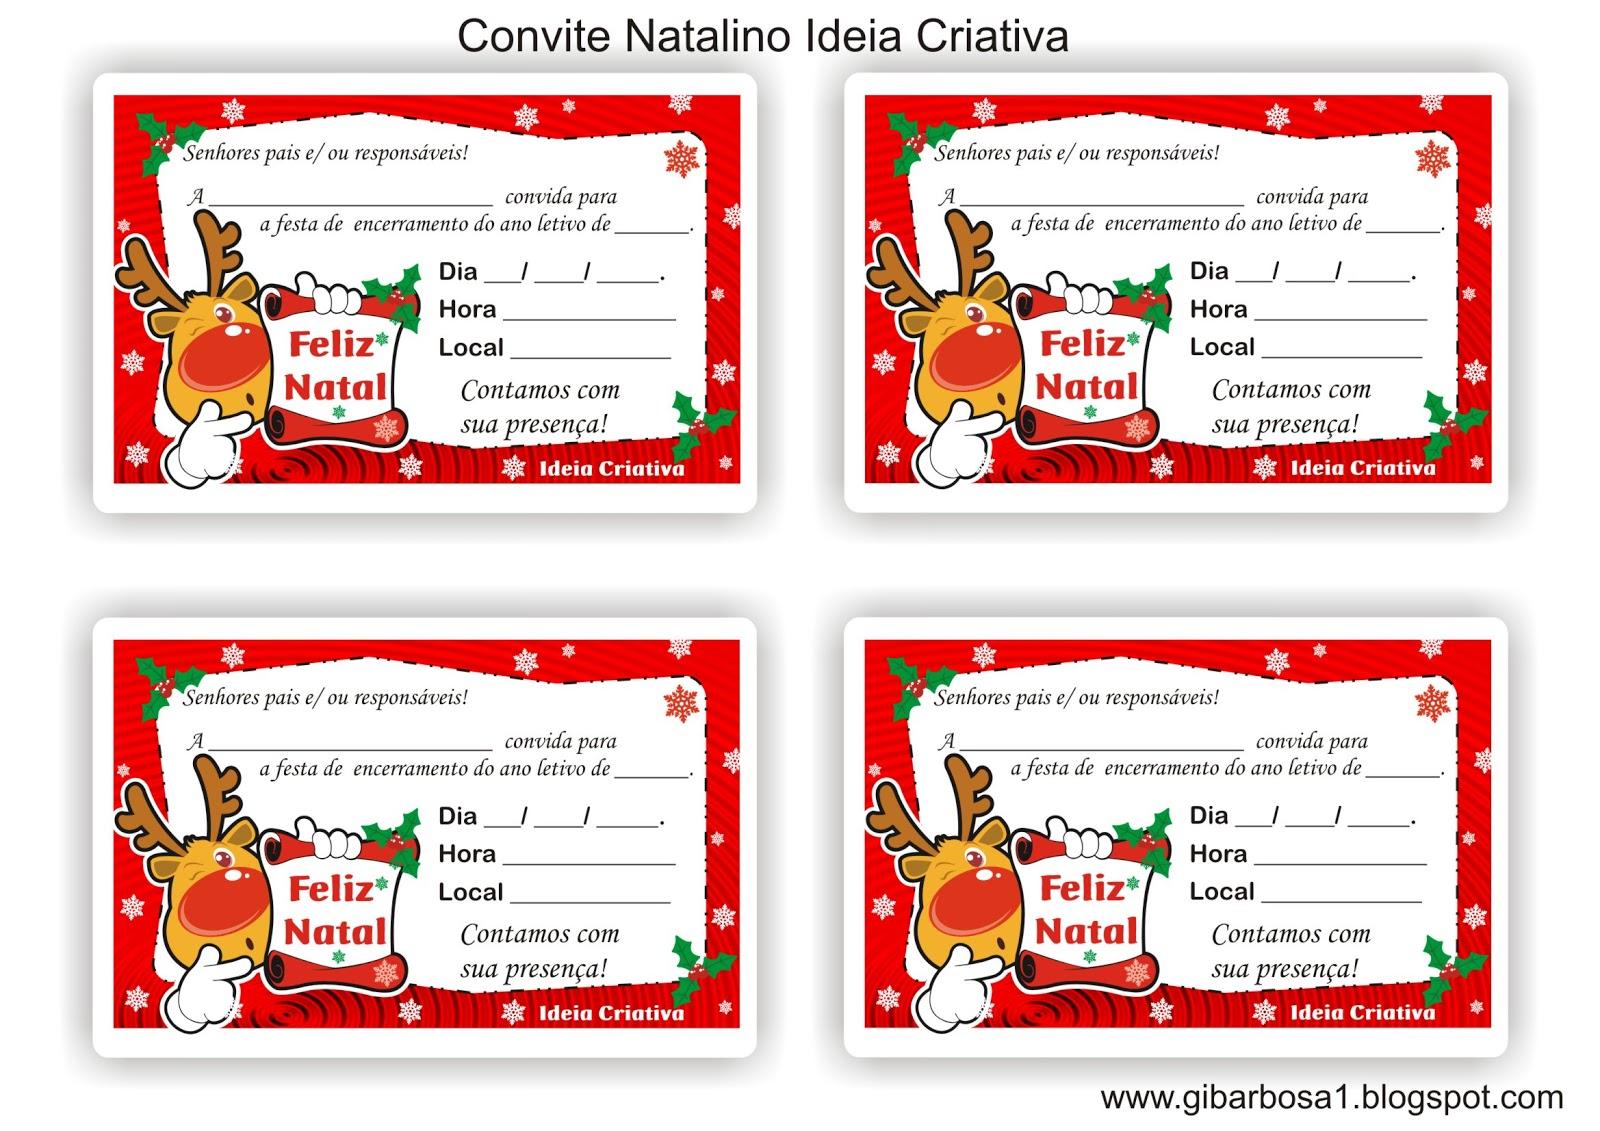 Preferência Convite Natalino | Ideia Criativa - Gi Barbosa Educação Infantil MC83